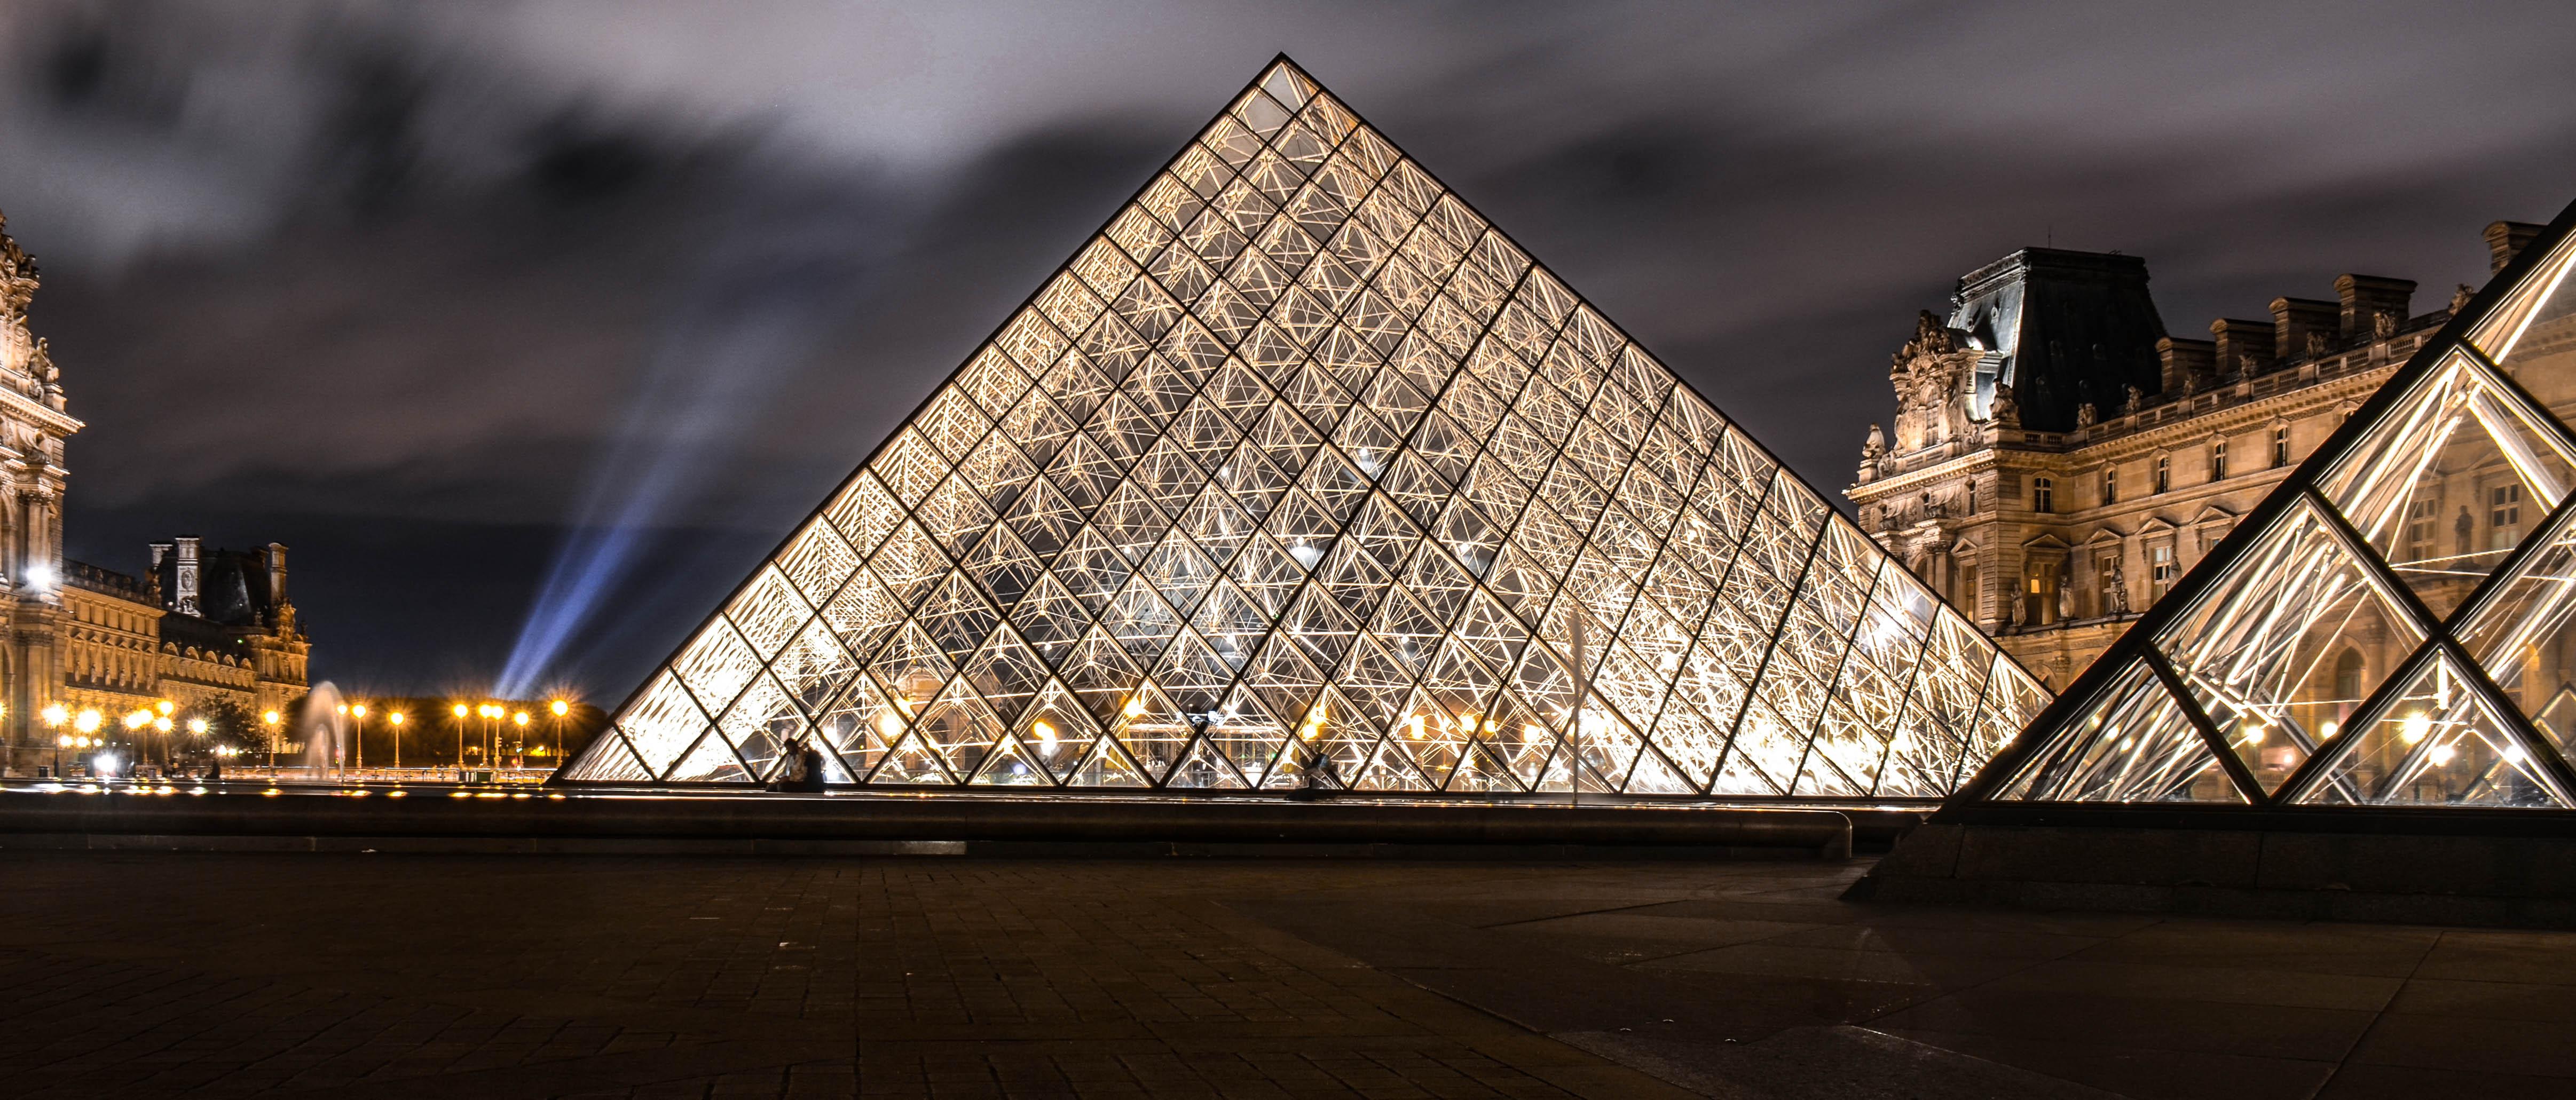 Paris Louvre Pyramid